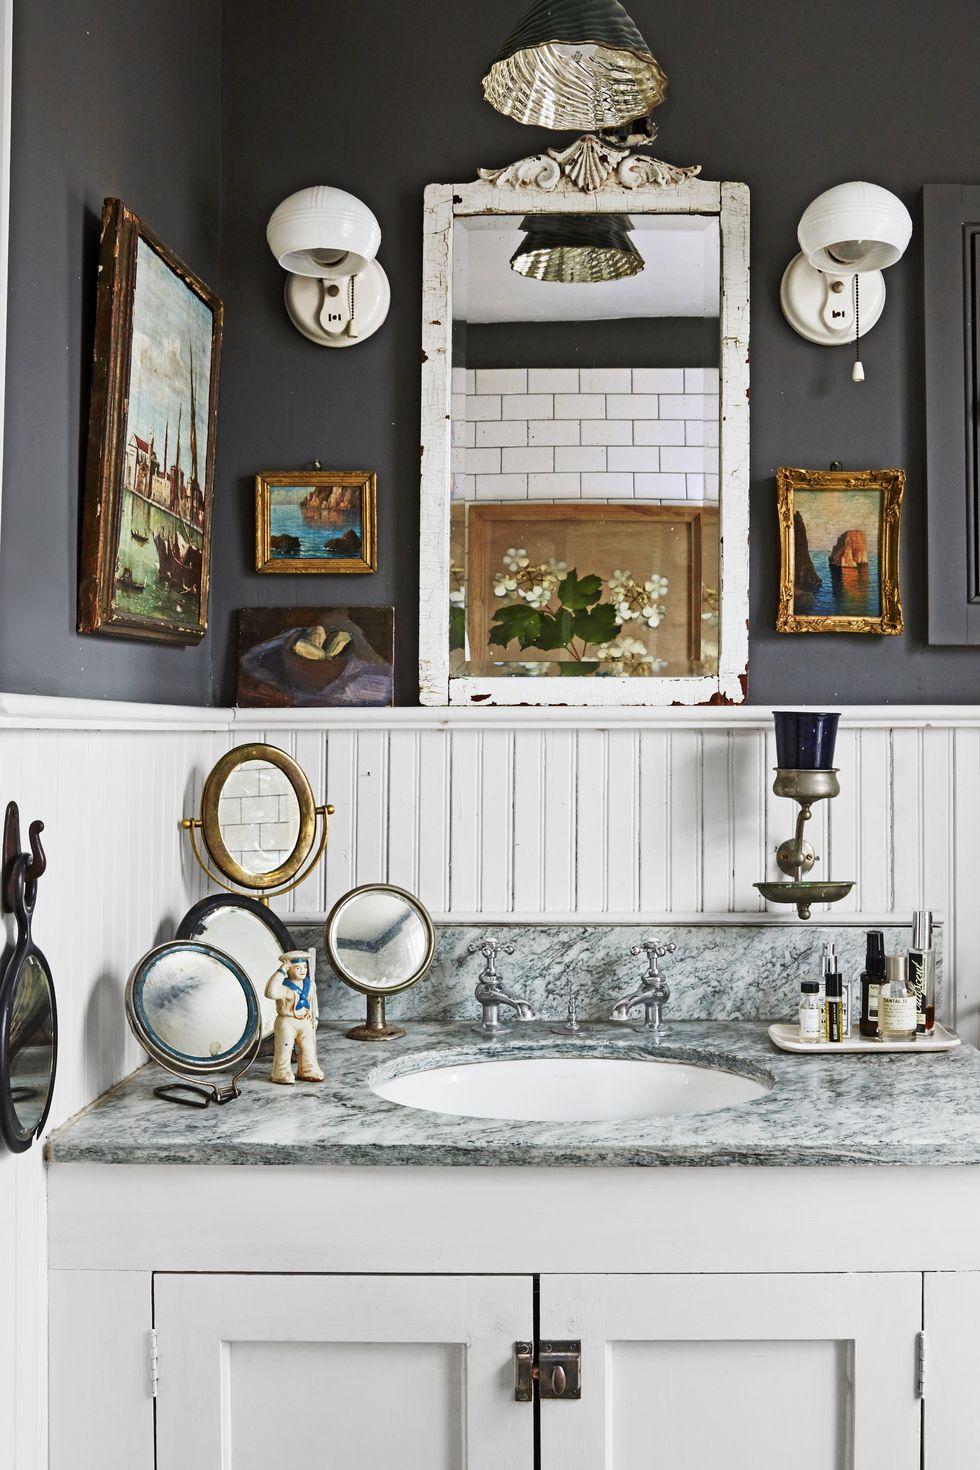 55 Bathroom Decorating Ideas Pictures, Vintage Bathroom Decor